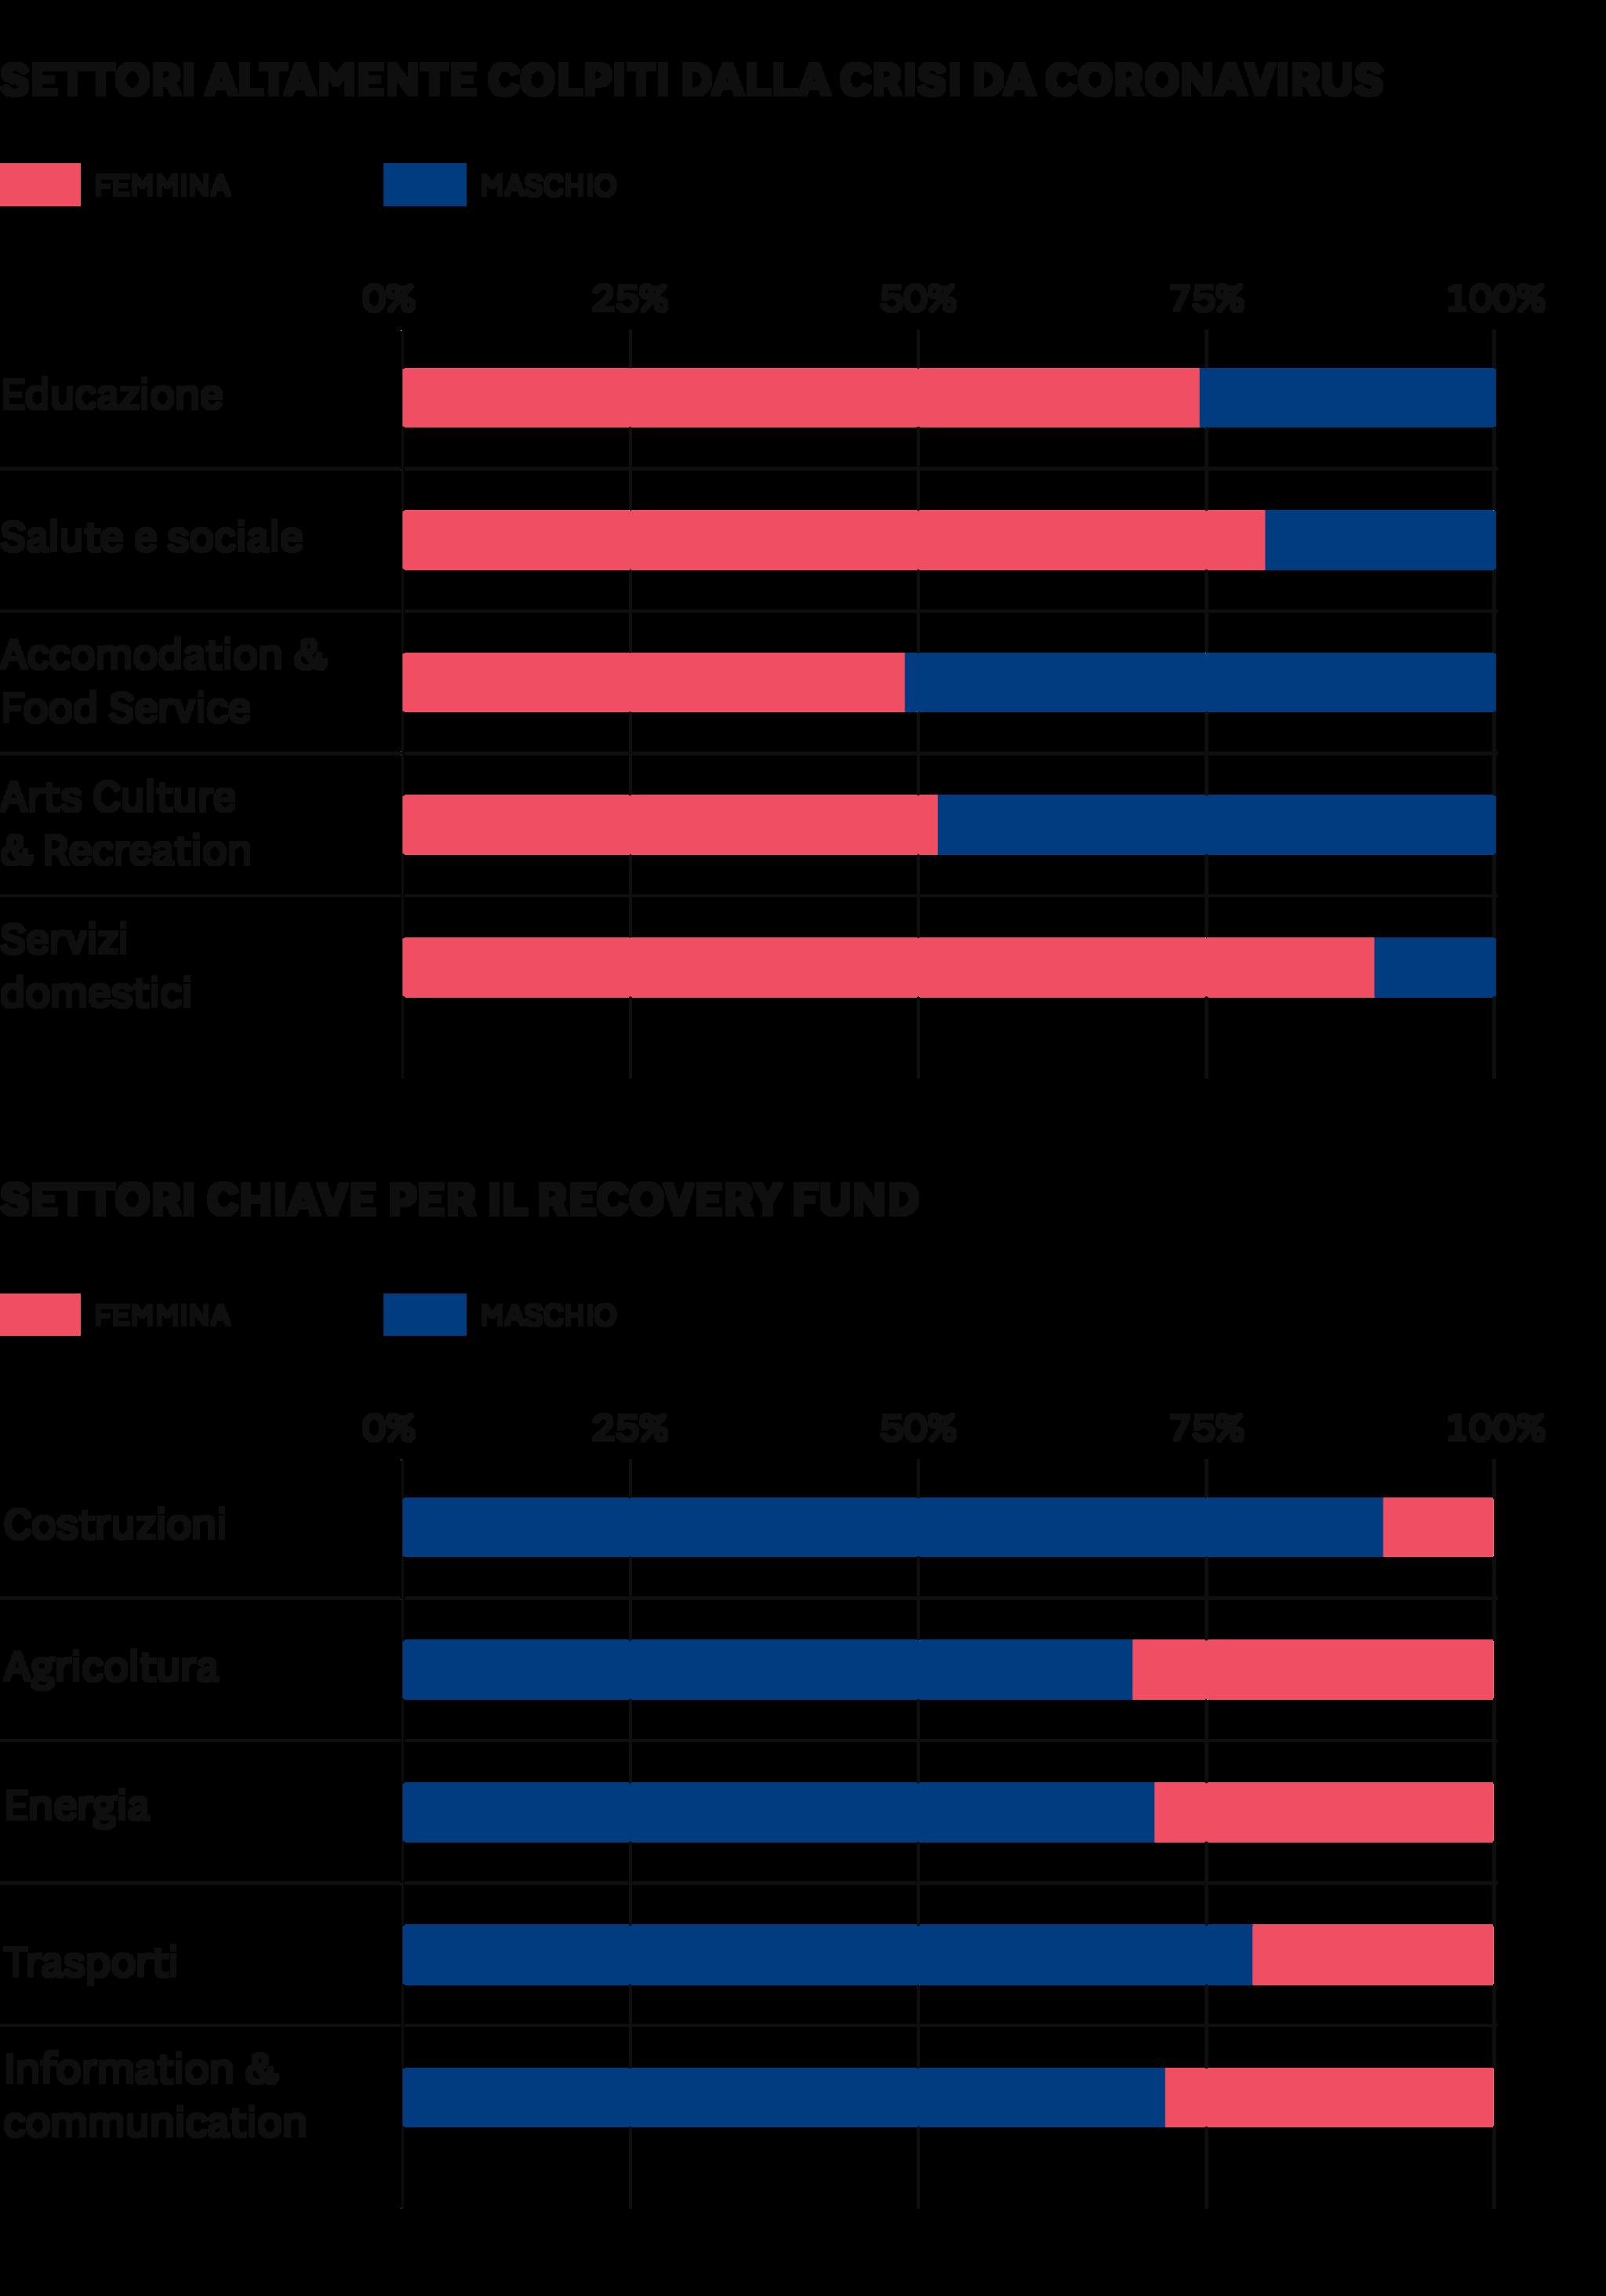 OCCUPAZIONE FEMMINILE E MASCHILE NEI DIVERSI SETTORI (%), EU-27,2019